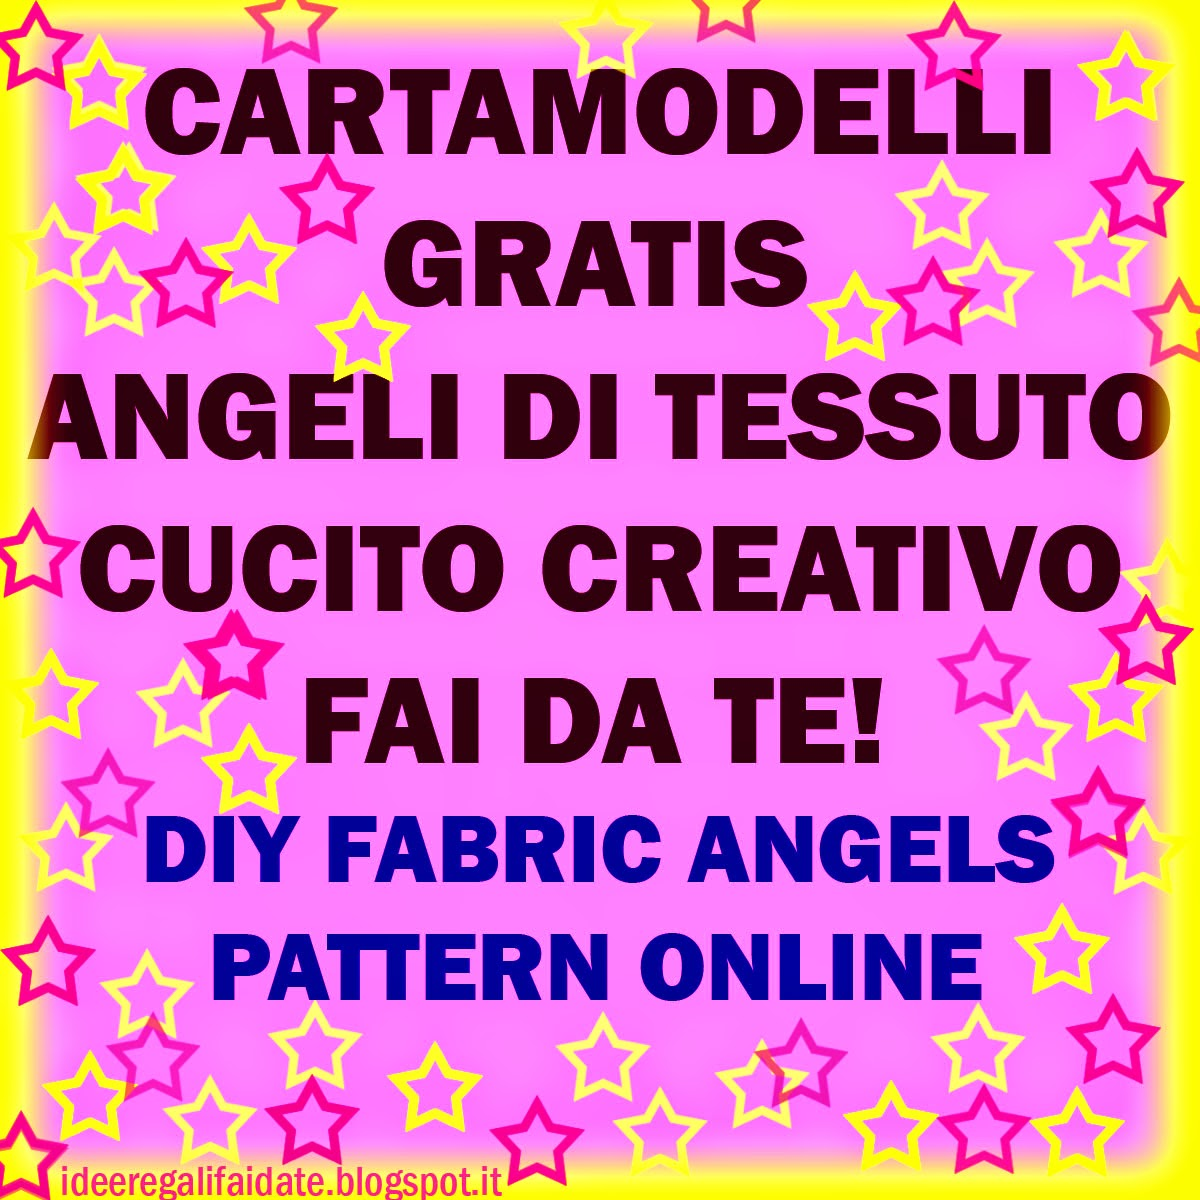 Cartamodelli angeli gratis on line free fabric angel for Fermaporta fai da te